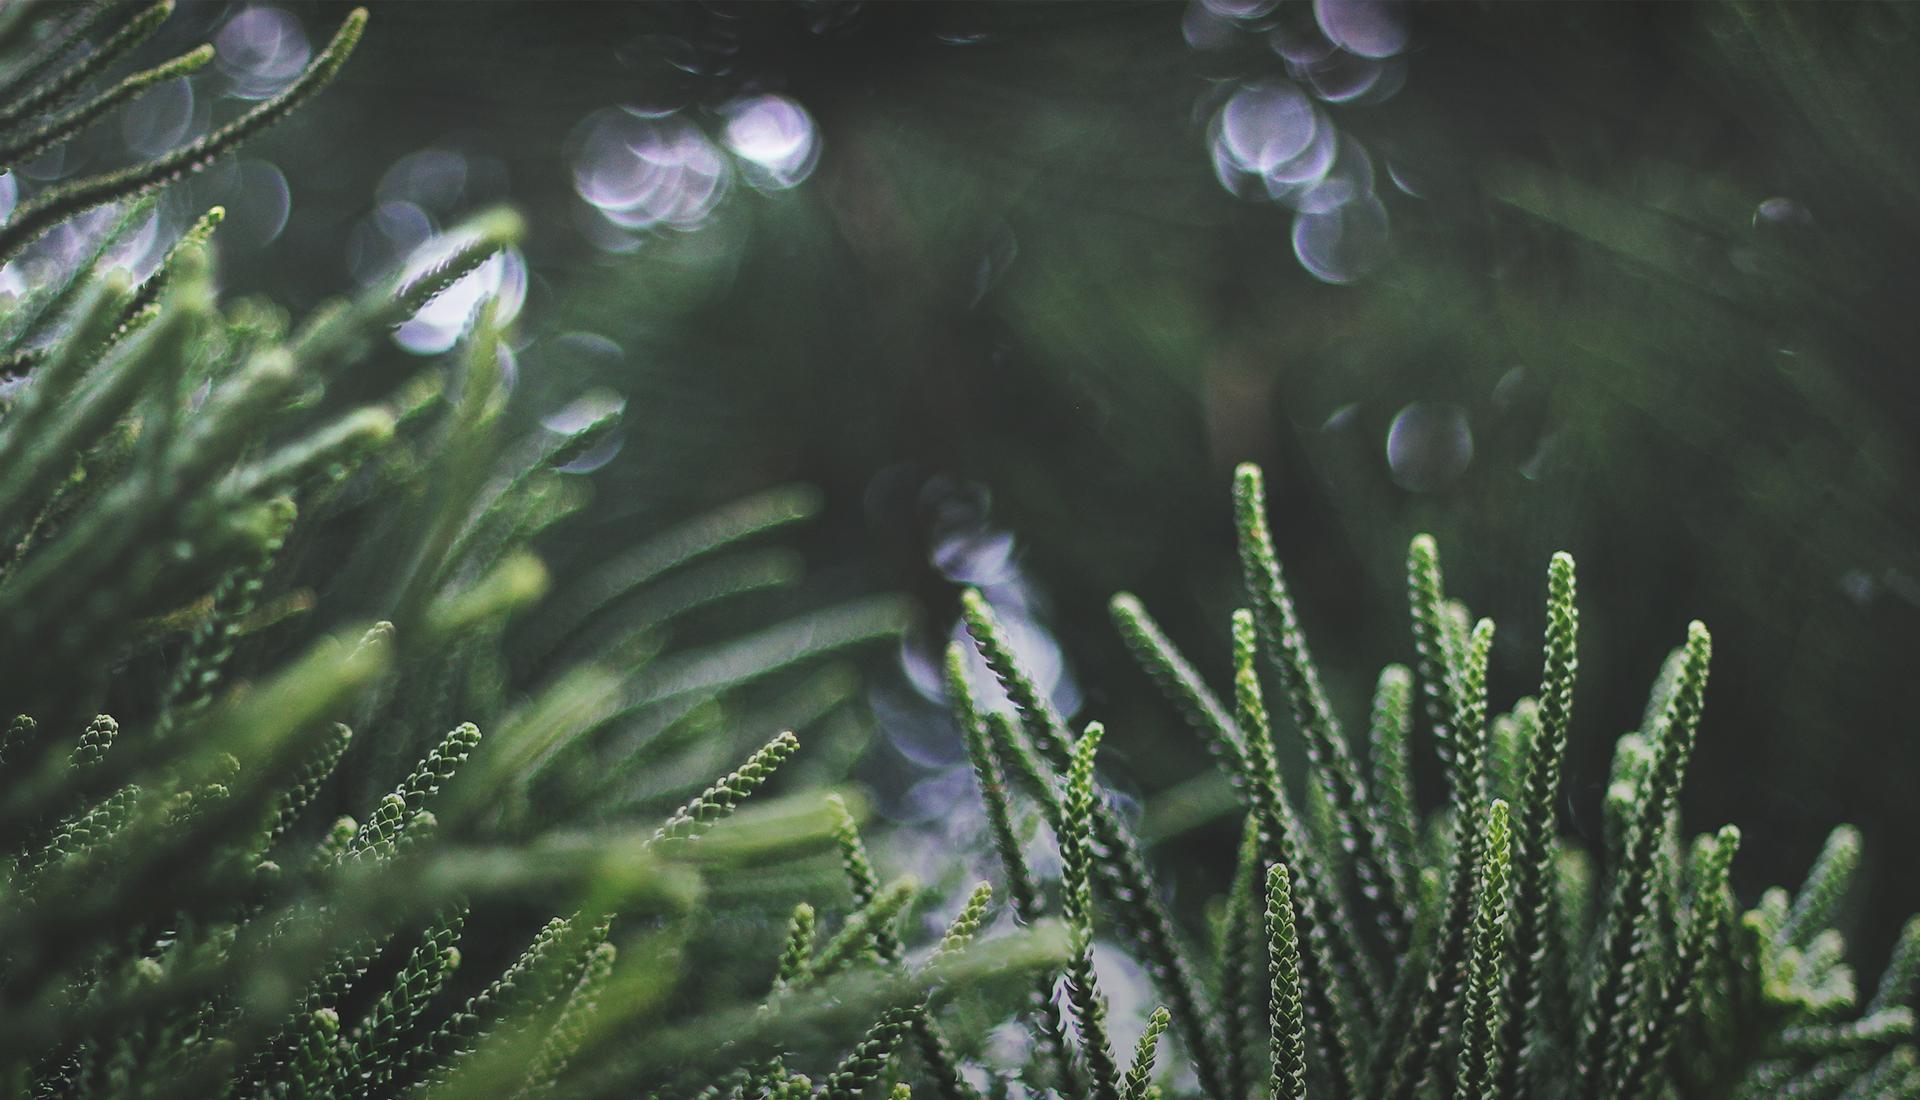 Frühjahrs-, Grab- & Adventsaustellung